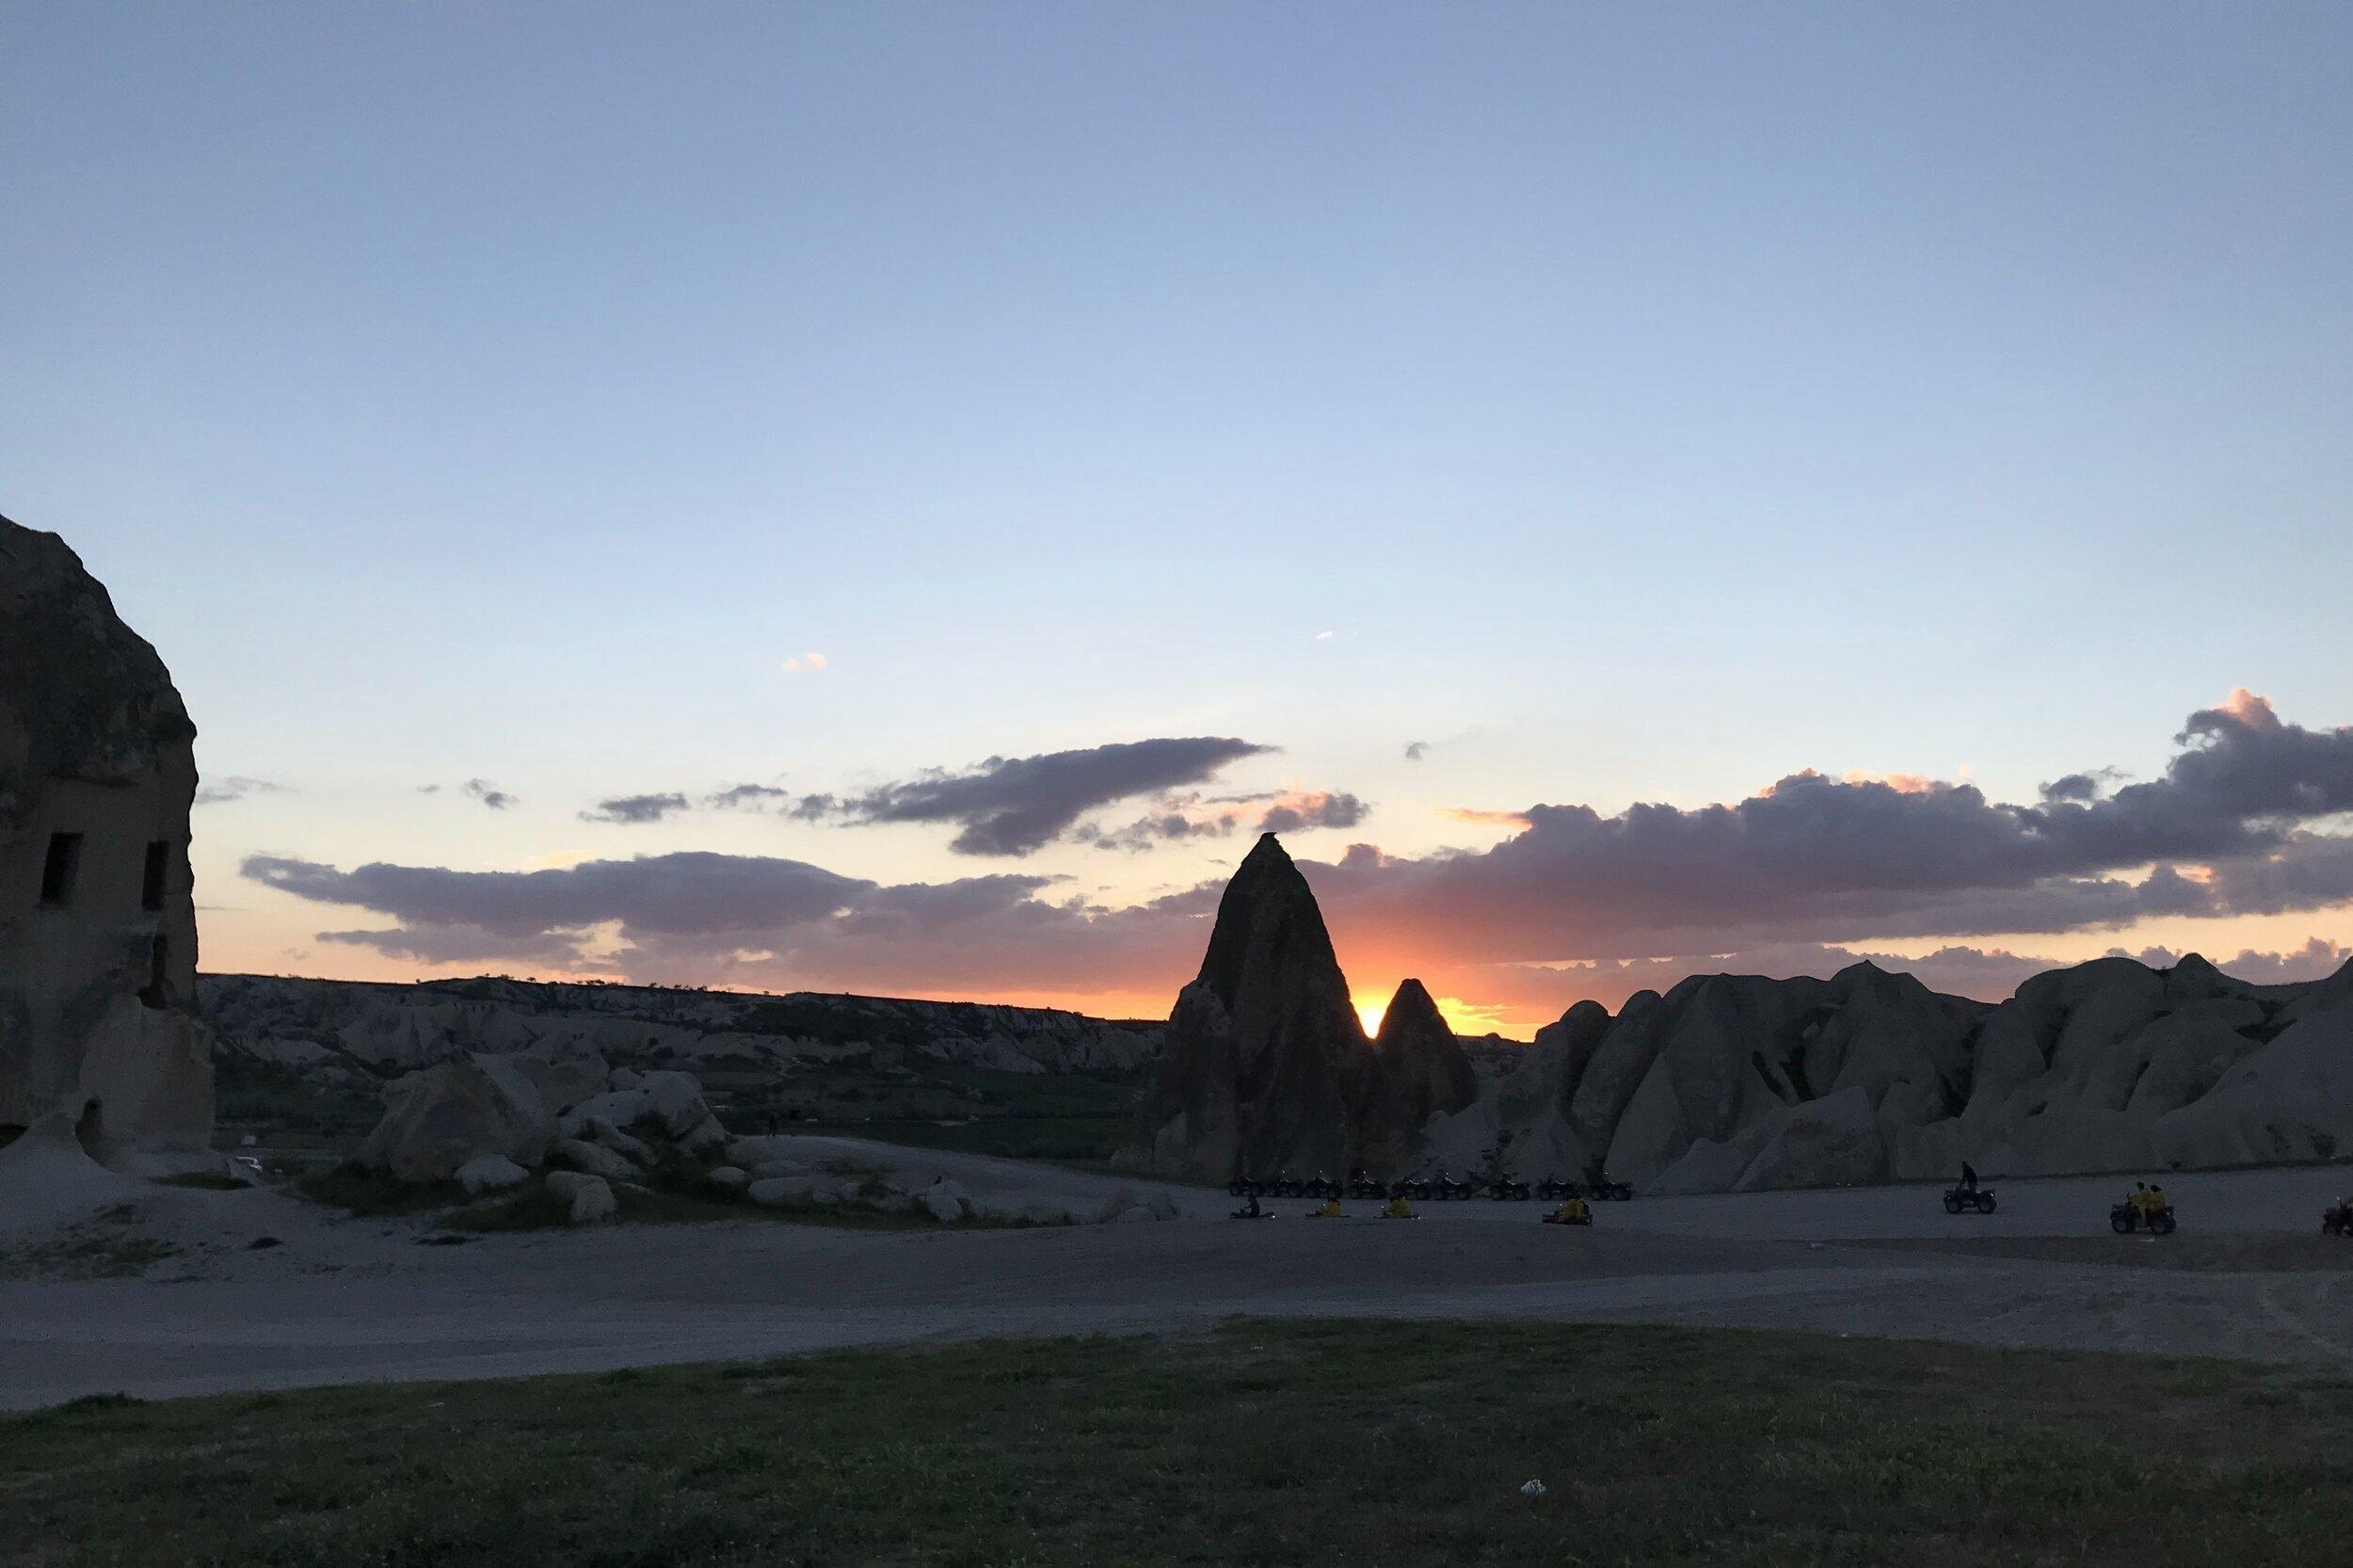 Sunset at Göreme National Park